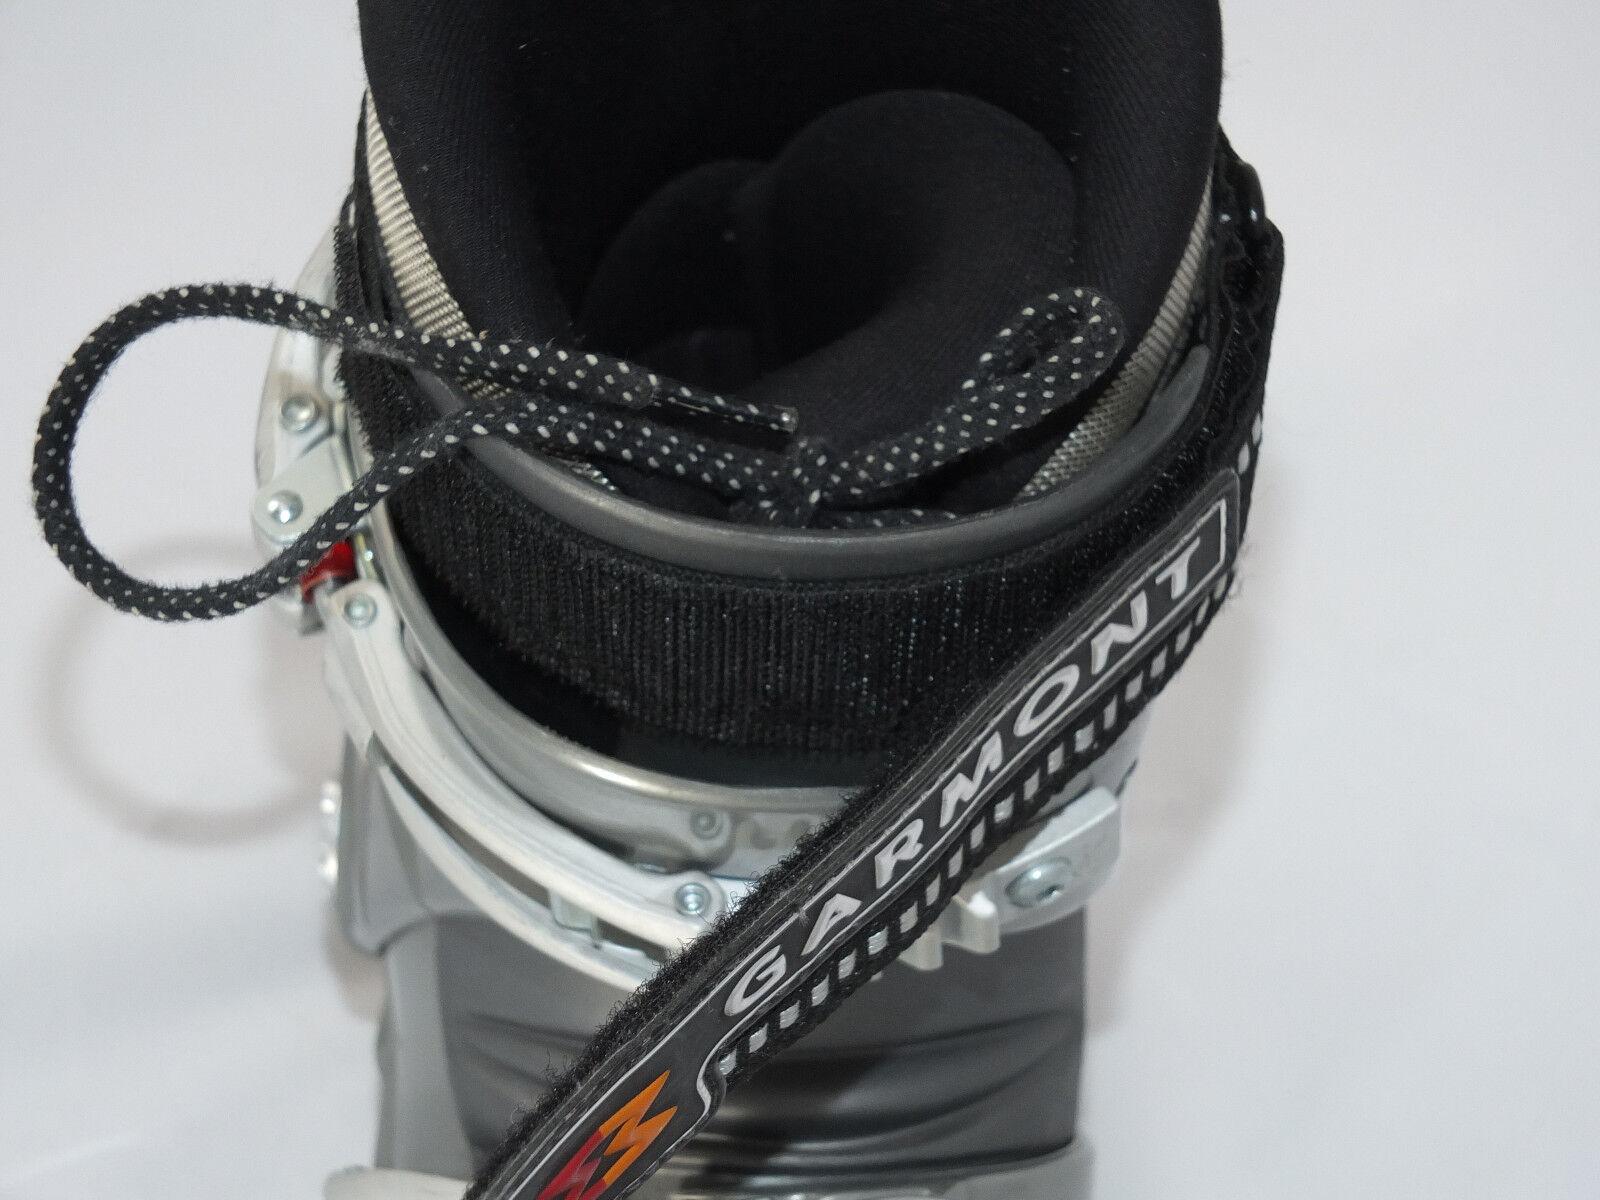 Tourenskischuh Garmont G-Lite, Touring-Skischuh mit Innenschuh, Größen Größen Größen wählbar e2856b